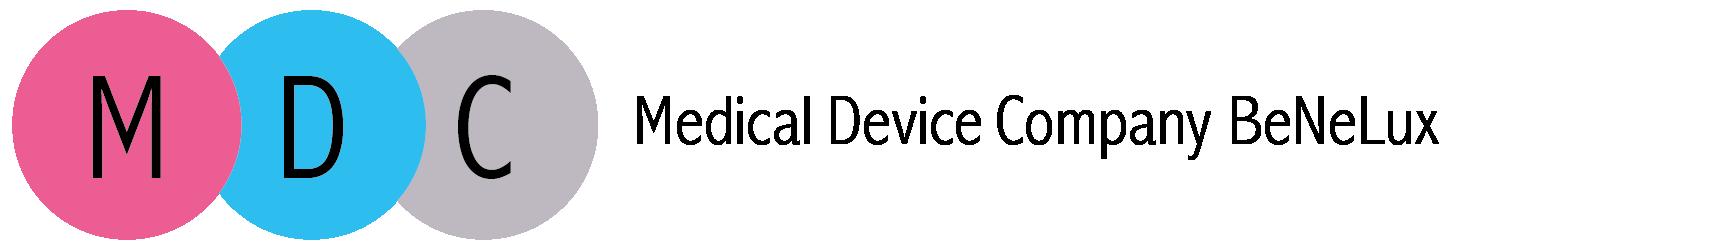 Medical Device Company BeNeLux Logo